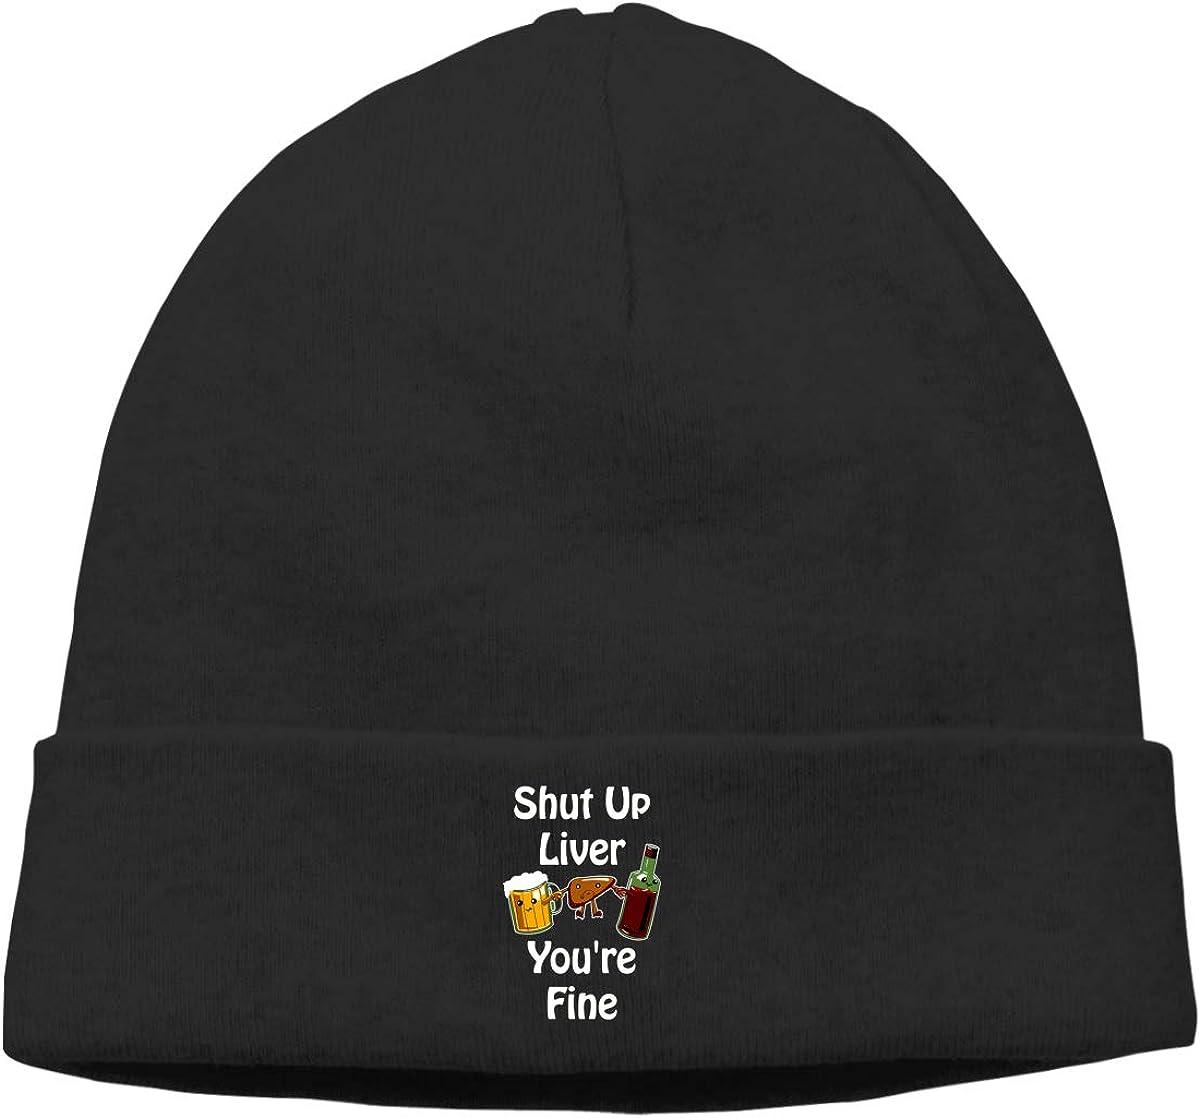 Nskngr Shut Up Liver Youre Fine Unisex Cuffed Warm /& Stylish Knit Cuff Beanie